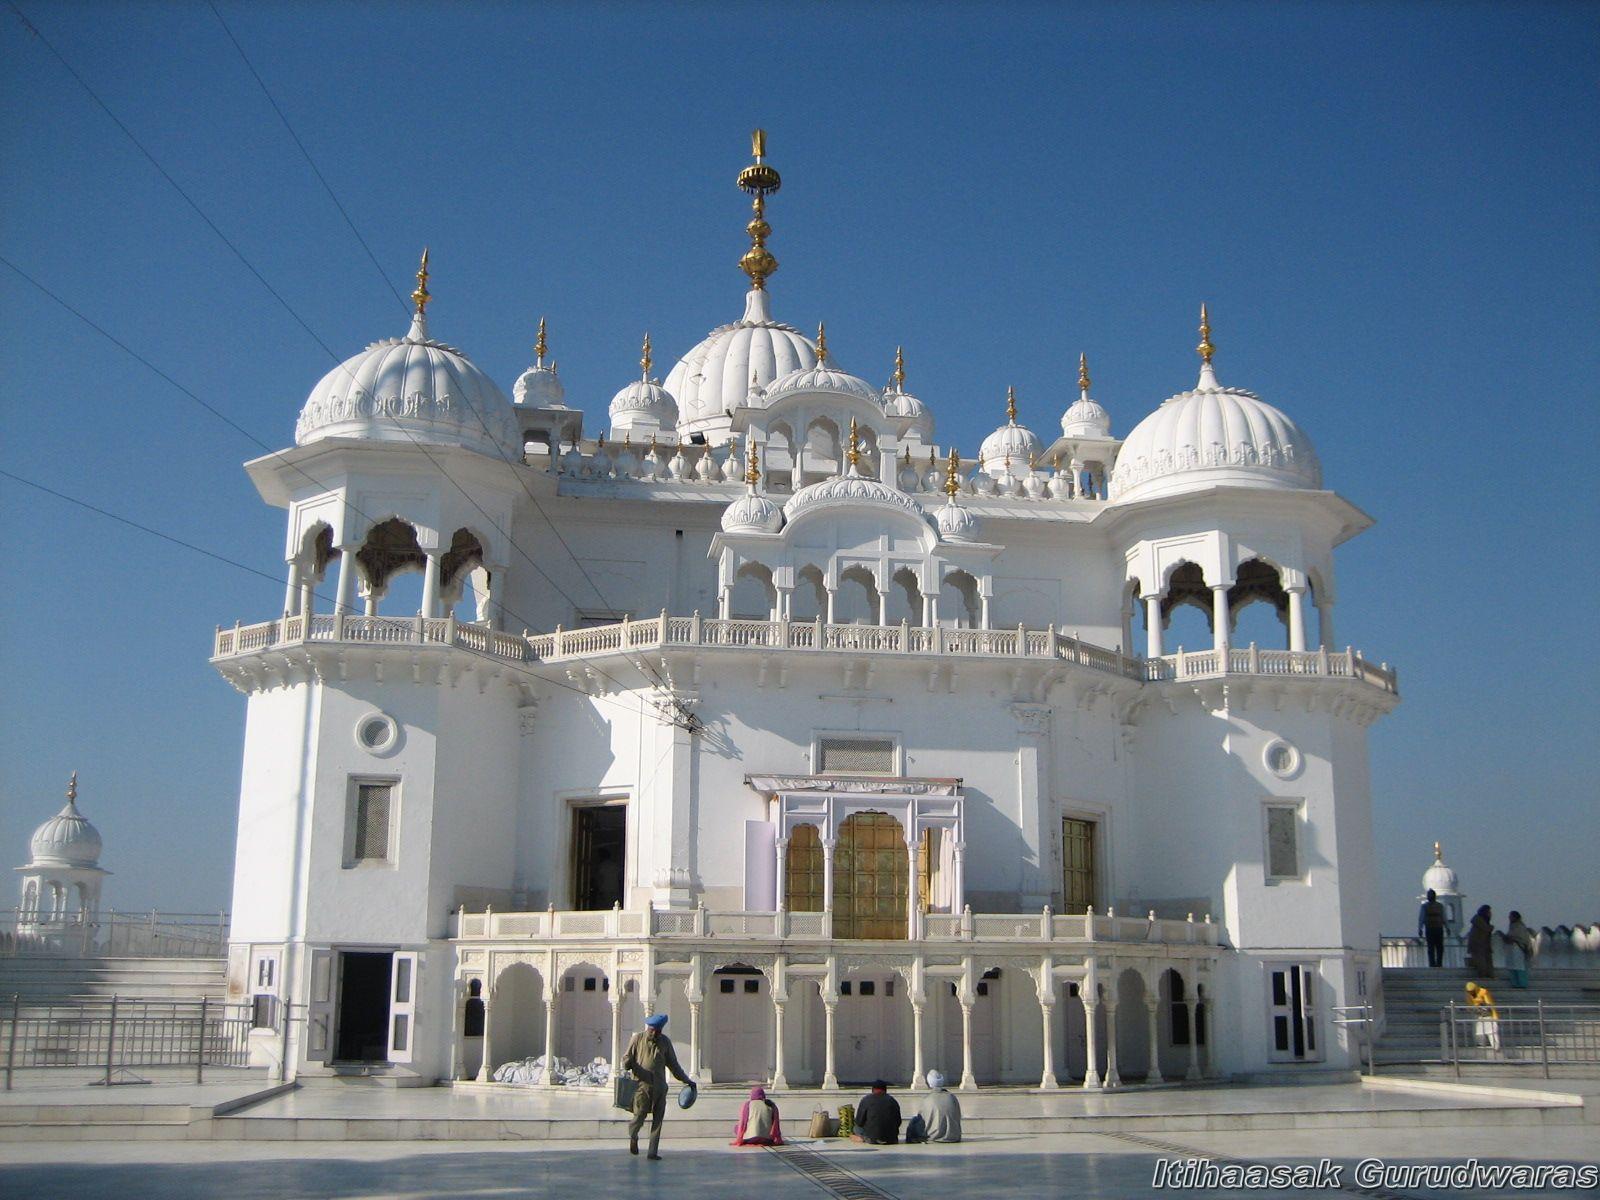 India Photo: Fatehgarh Sahib in Punjab India